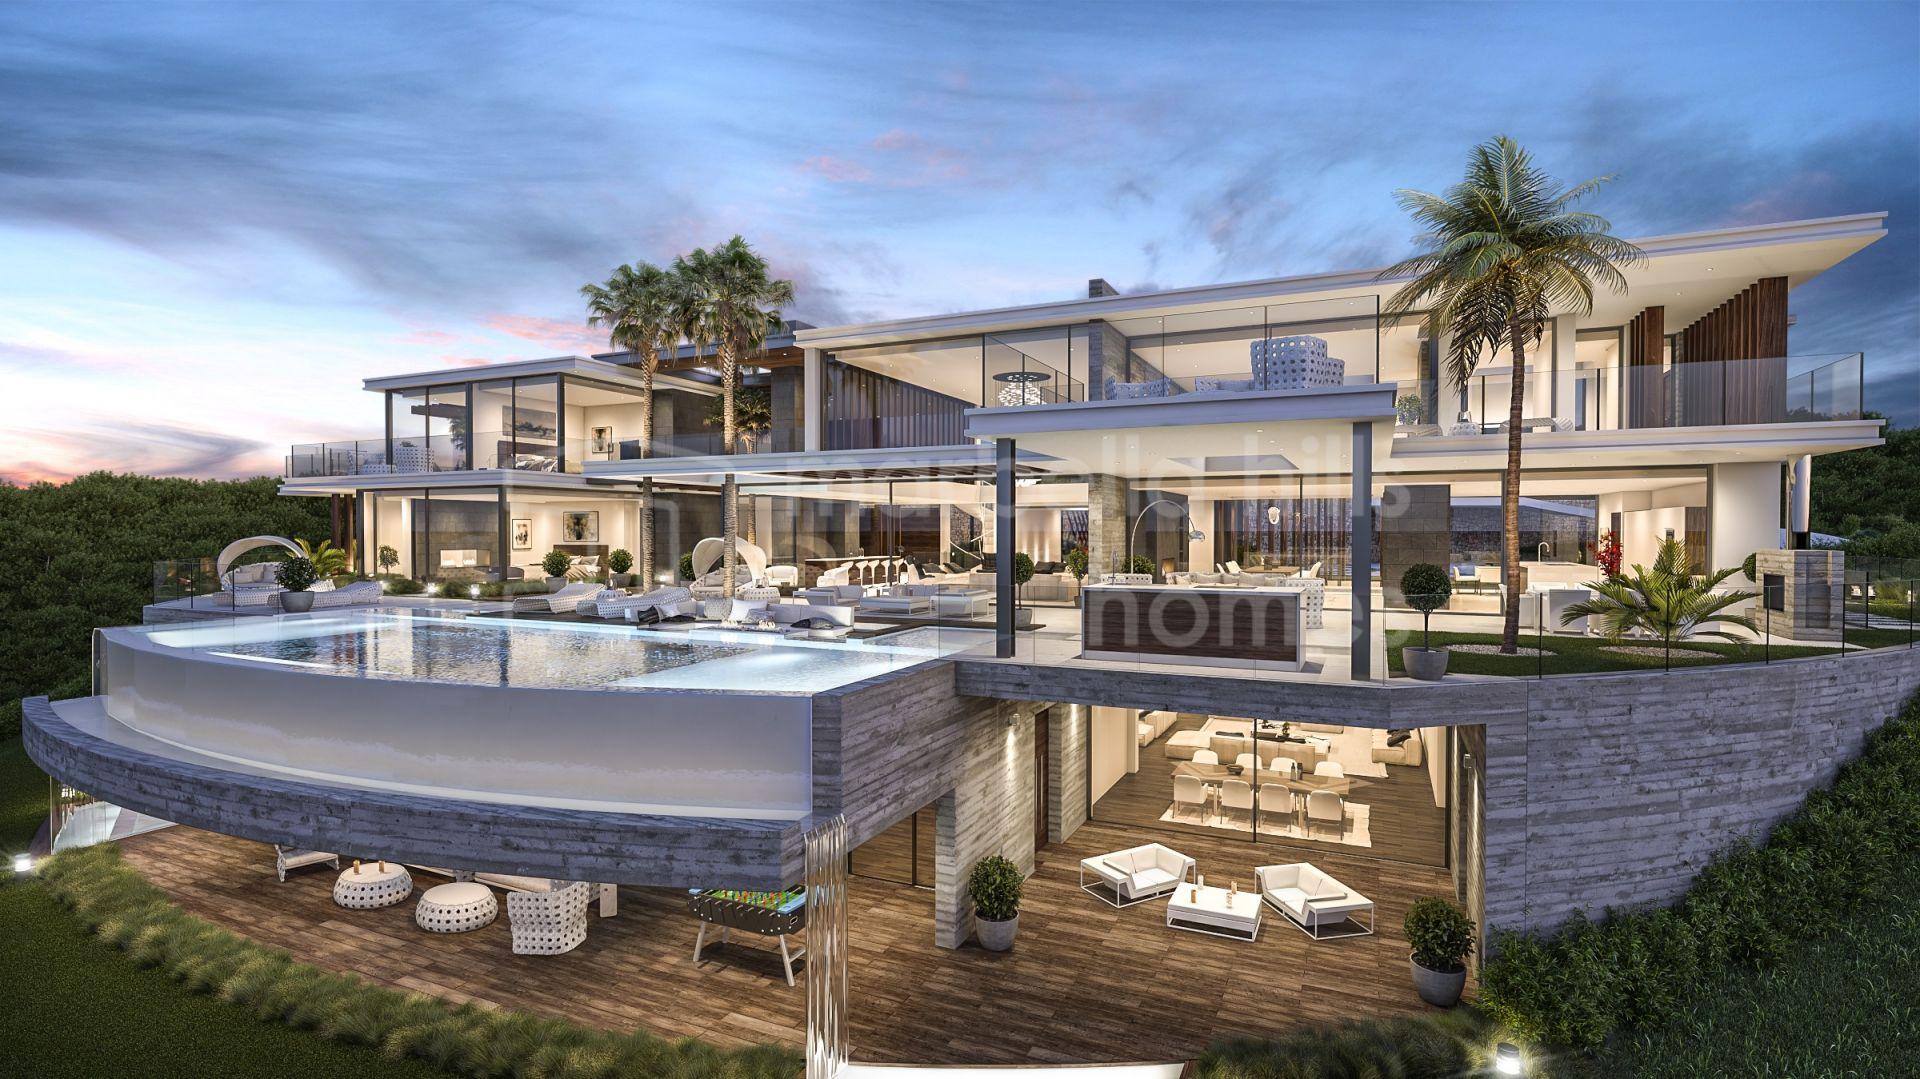 Nouvelle r alisation d 39 une luxueuse villa la zagaleta - Ambience home design marbella ...